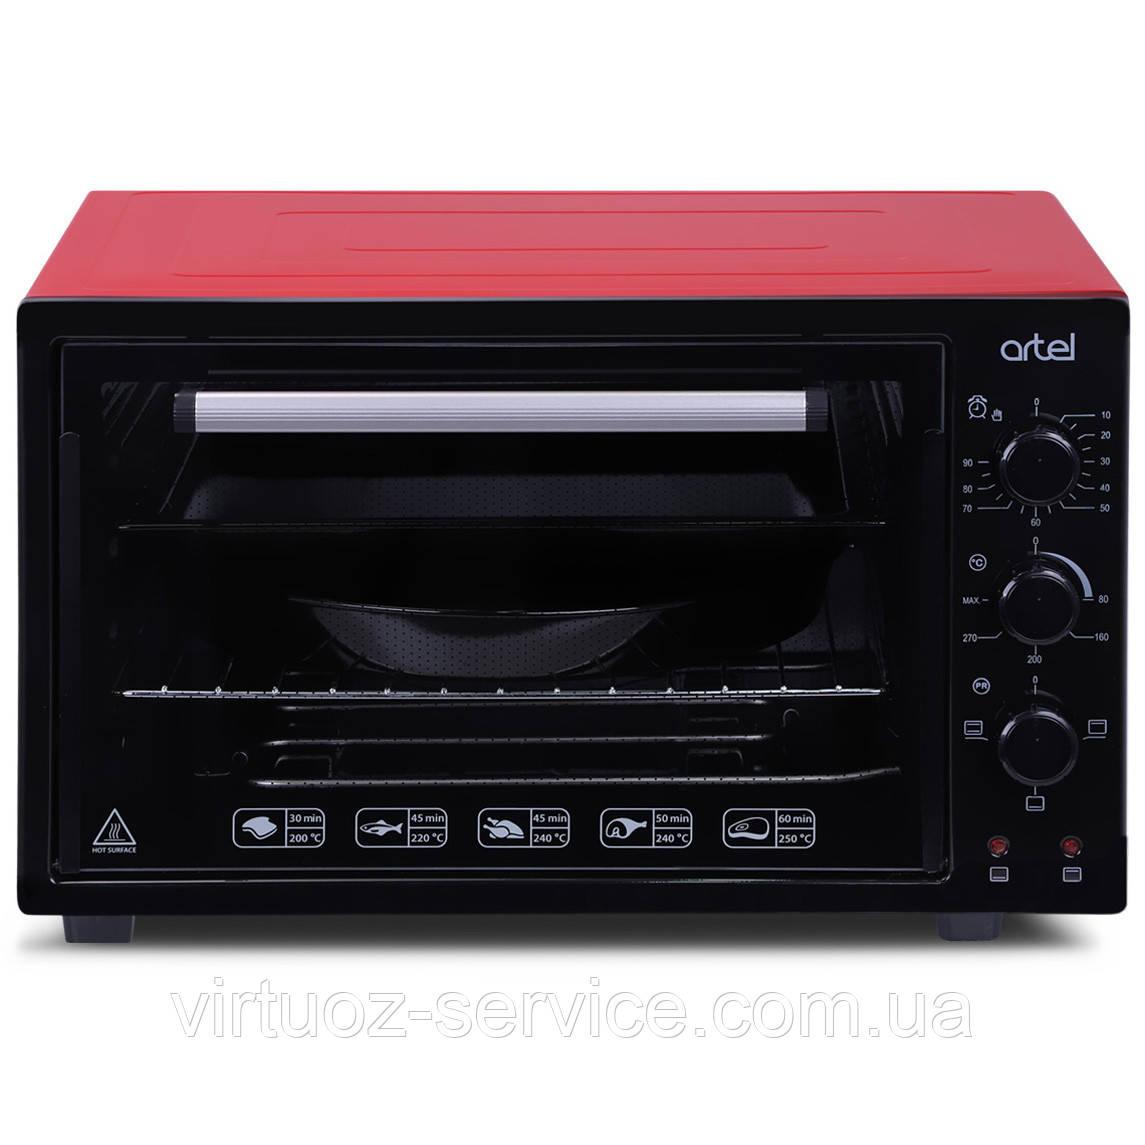 Электрическая духовка Artel MD 3612 E Red